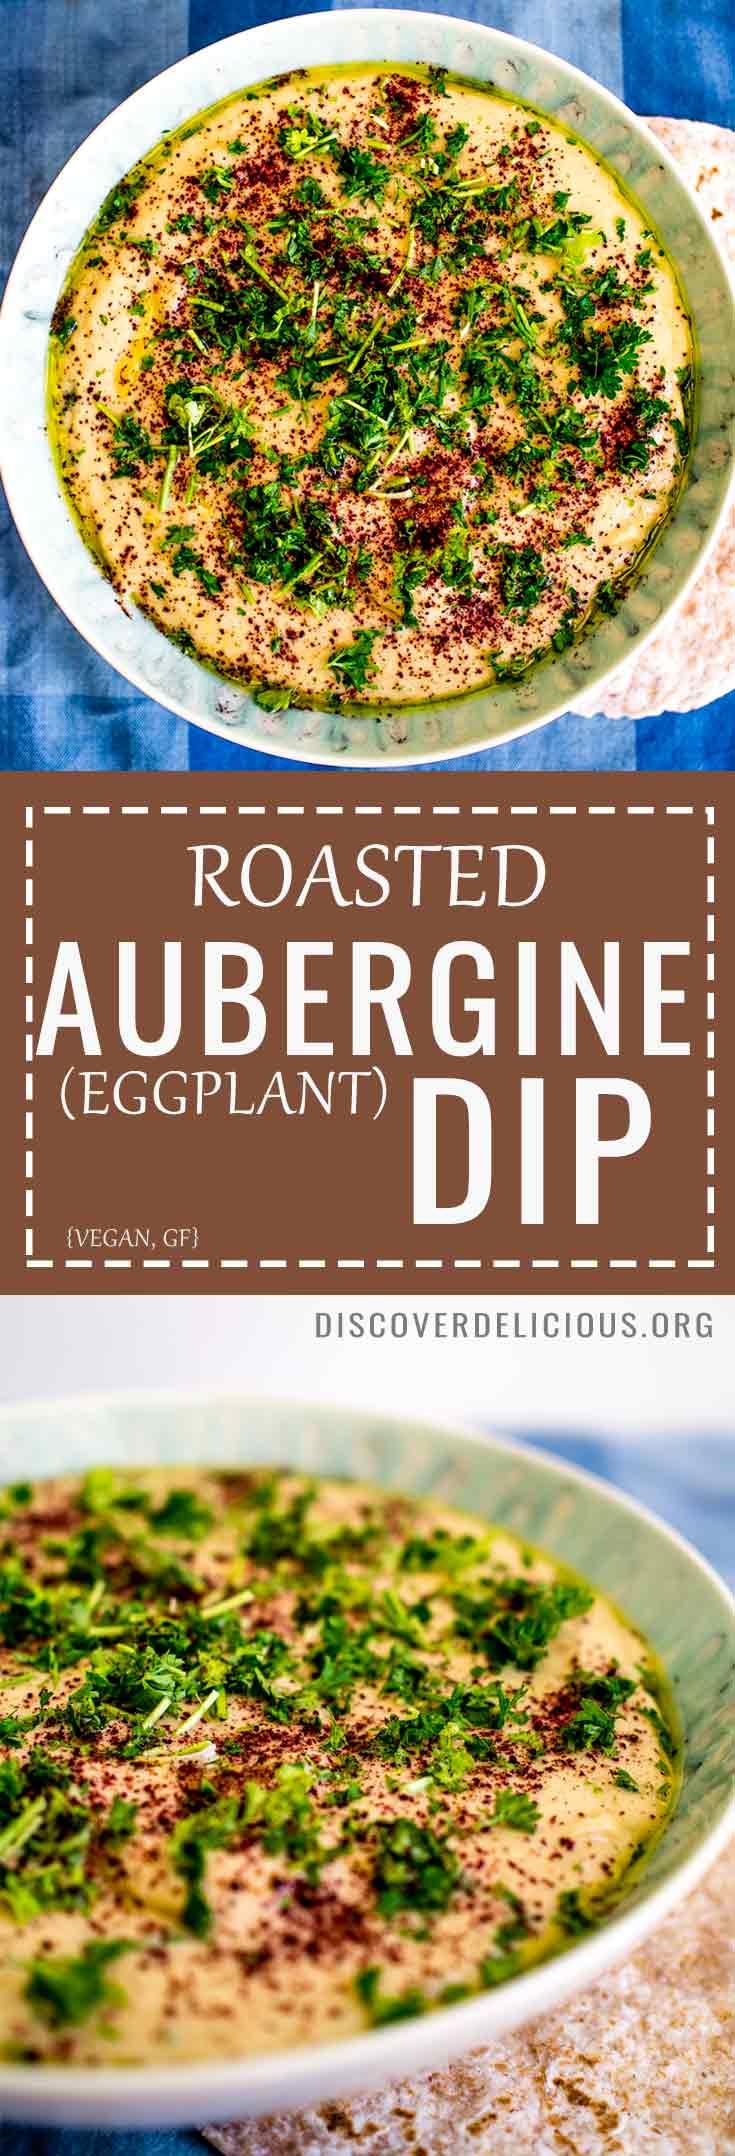 Roasted Aubergine (eggplant) Dip -smooth and creamy with a zing from lemon & sumac! Vegan + GF too. #eggplant #tahini #sauce #vegan #spread #dips #recipe #recipes #parsley #healthy #easy #baba #garlic #gluten #free